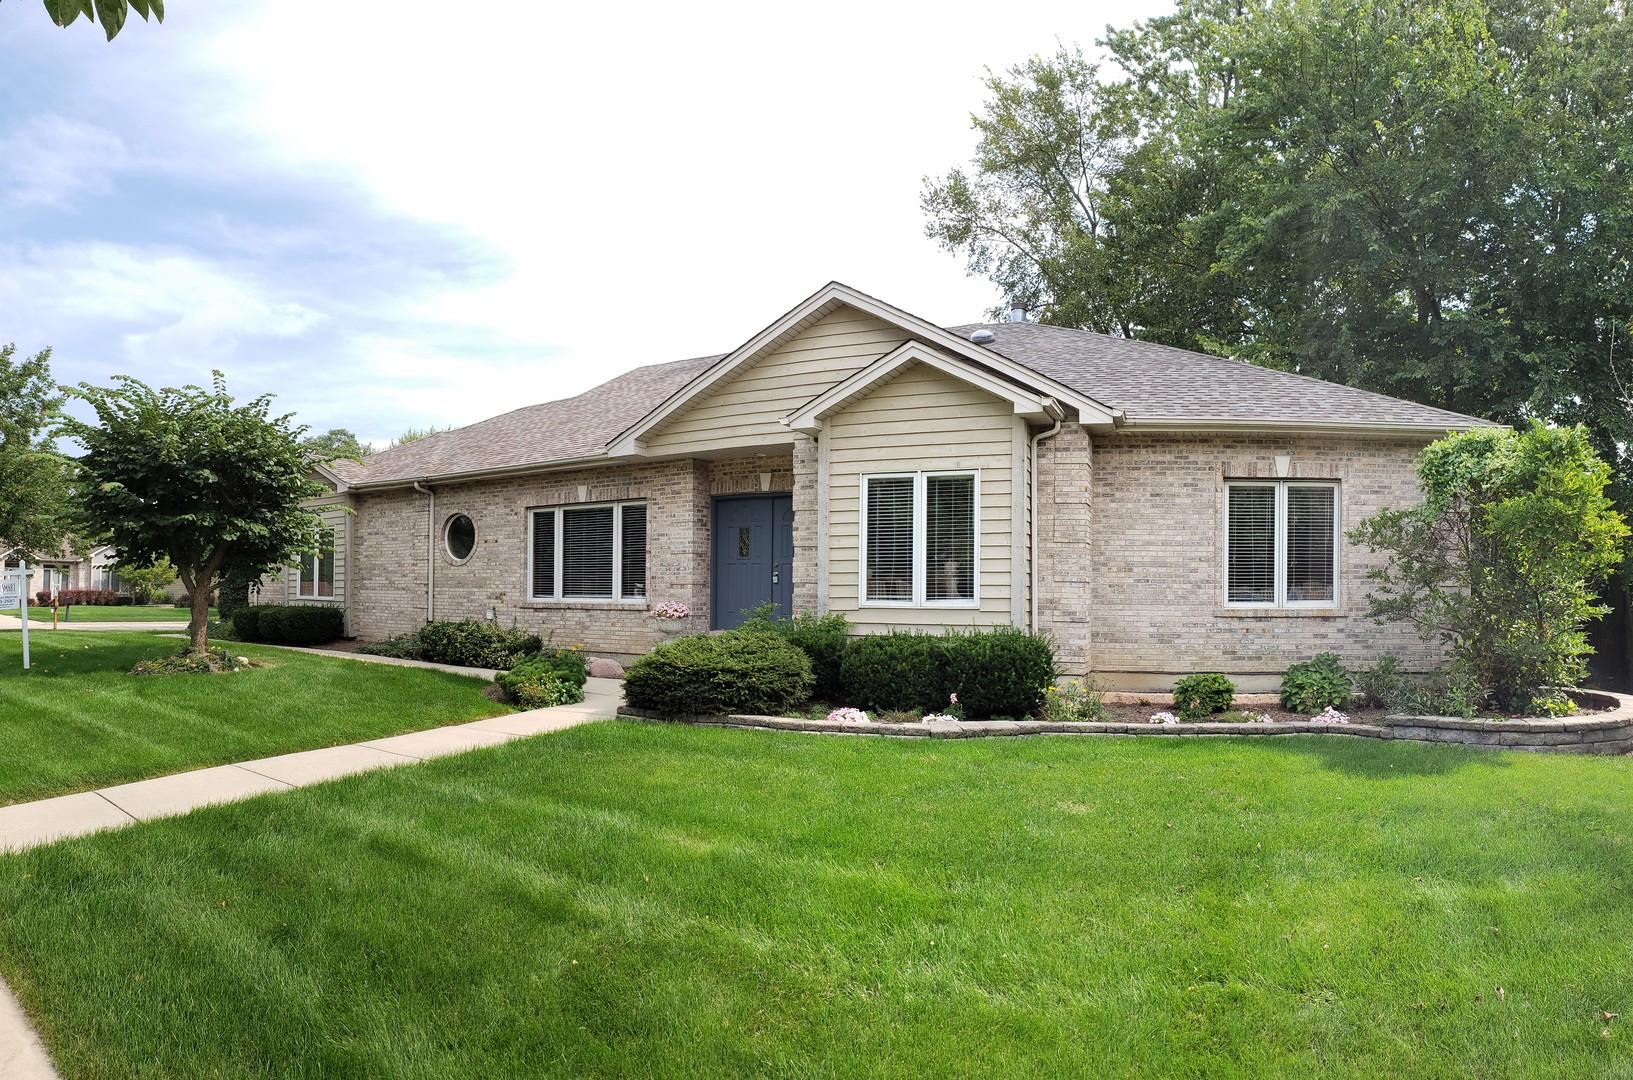 806 Grove ,West Chicago, Illinois 60185